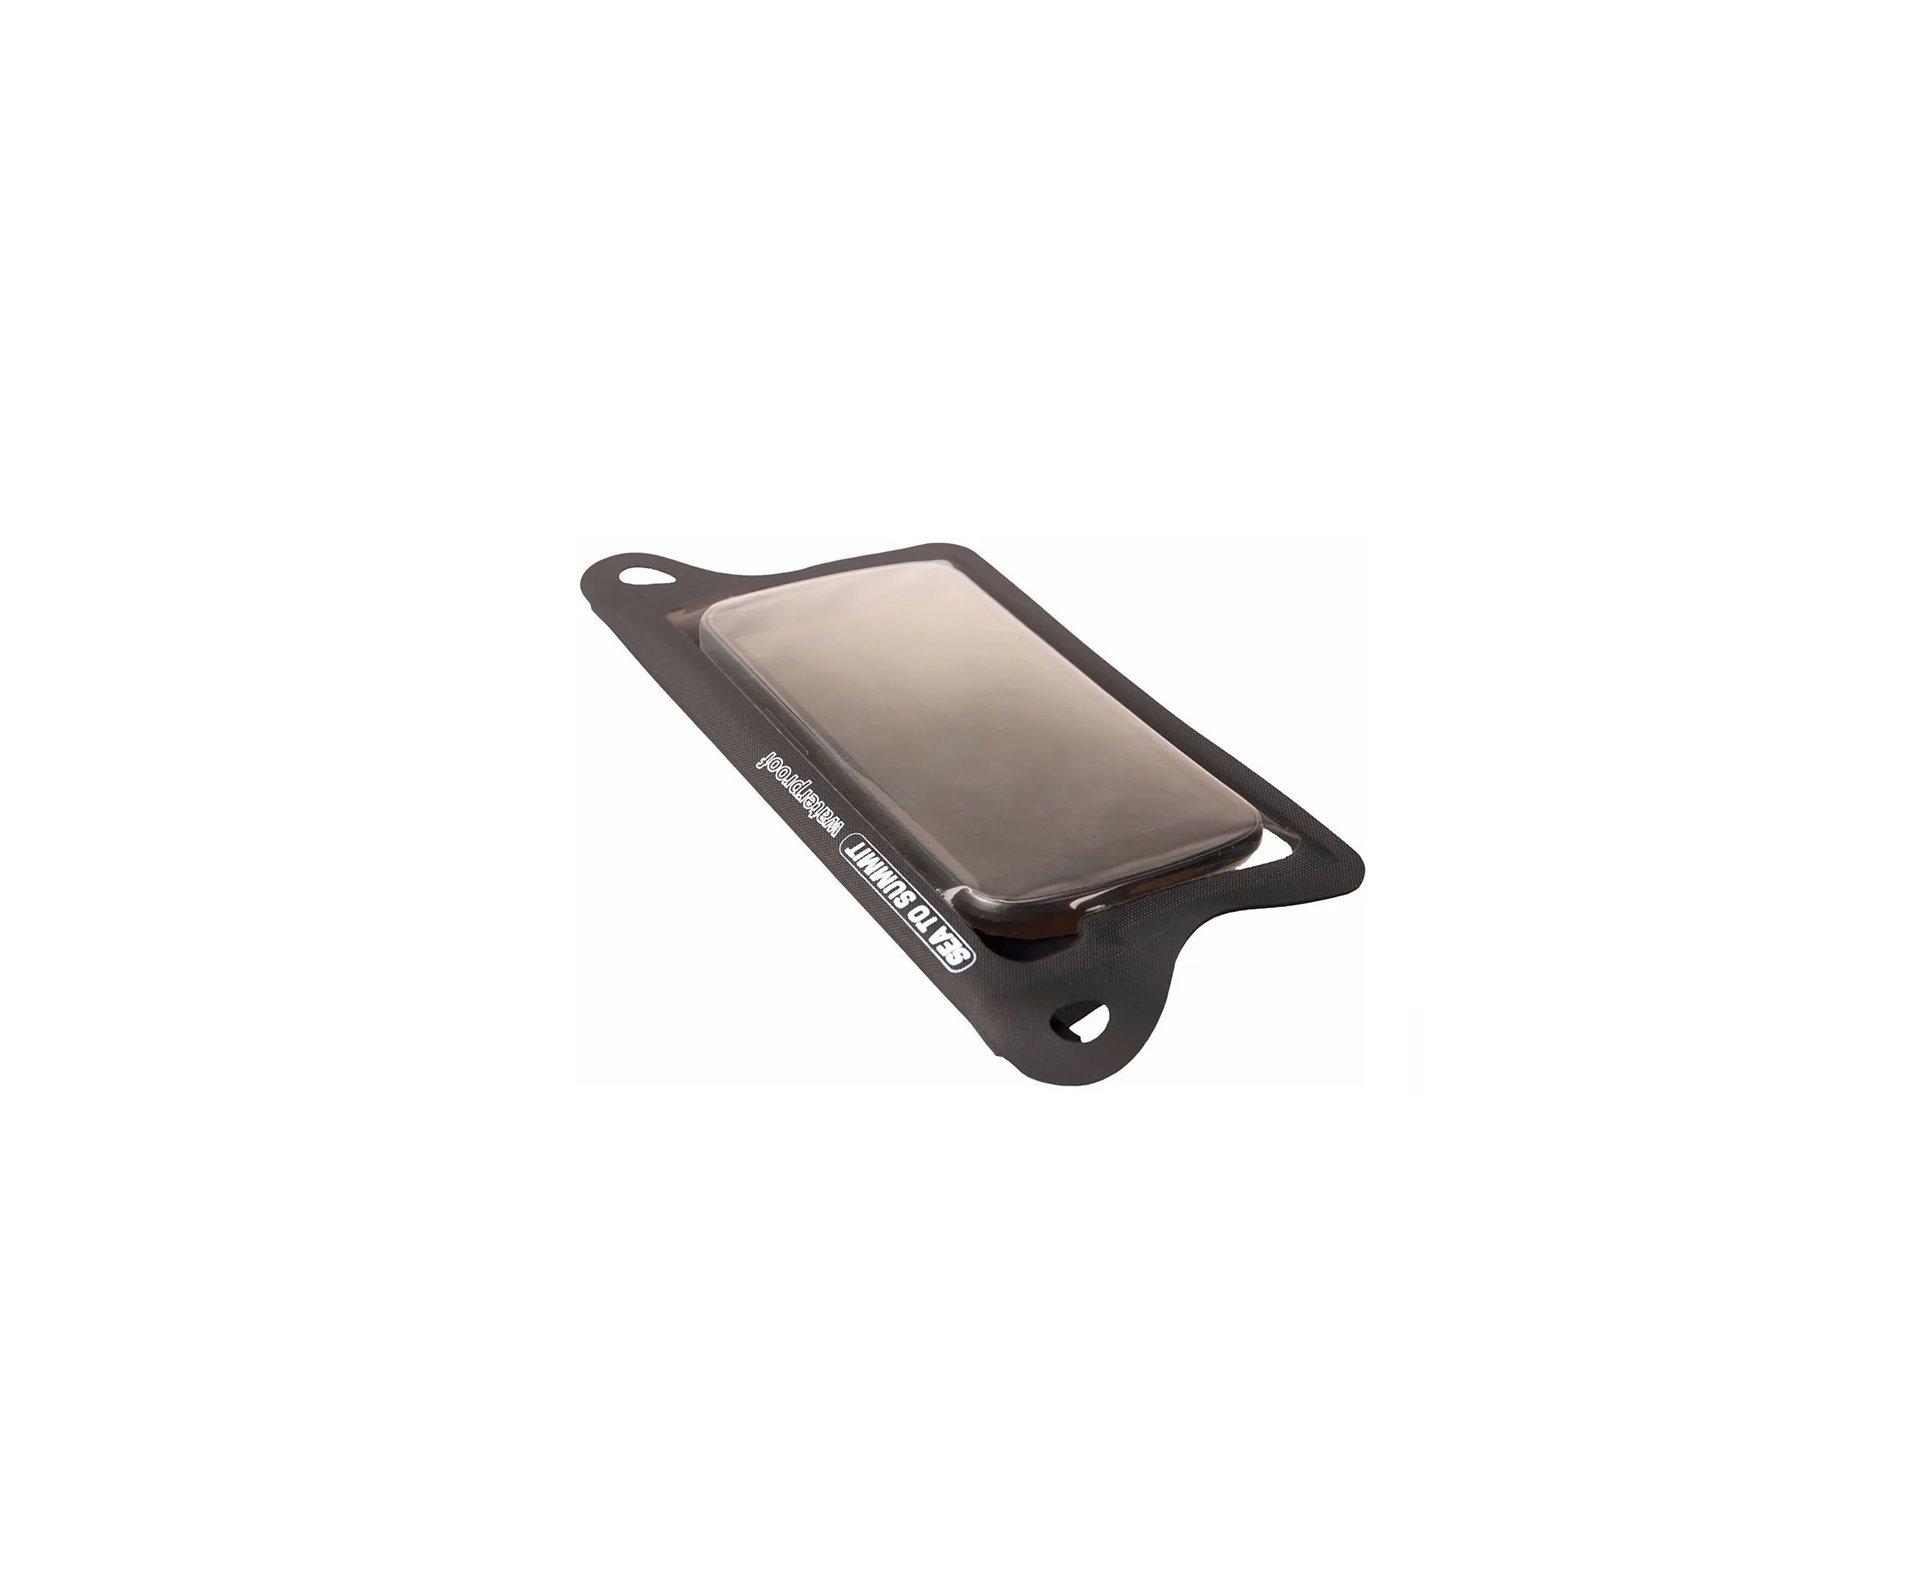 Capa Para Iphone 5 Tpu Impermeável - Sea To Summit